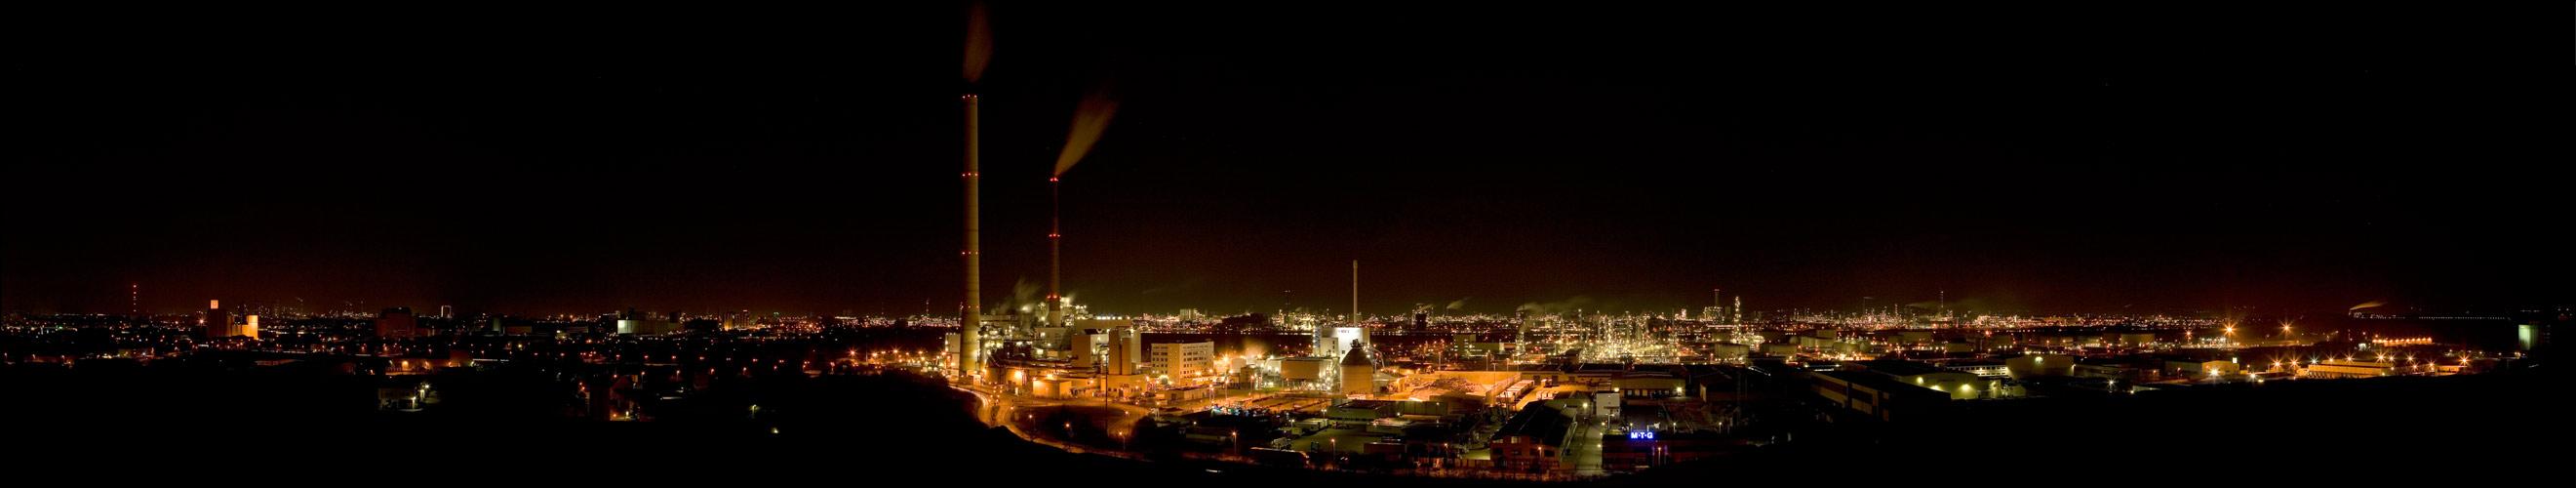 Industrieromantik II